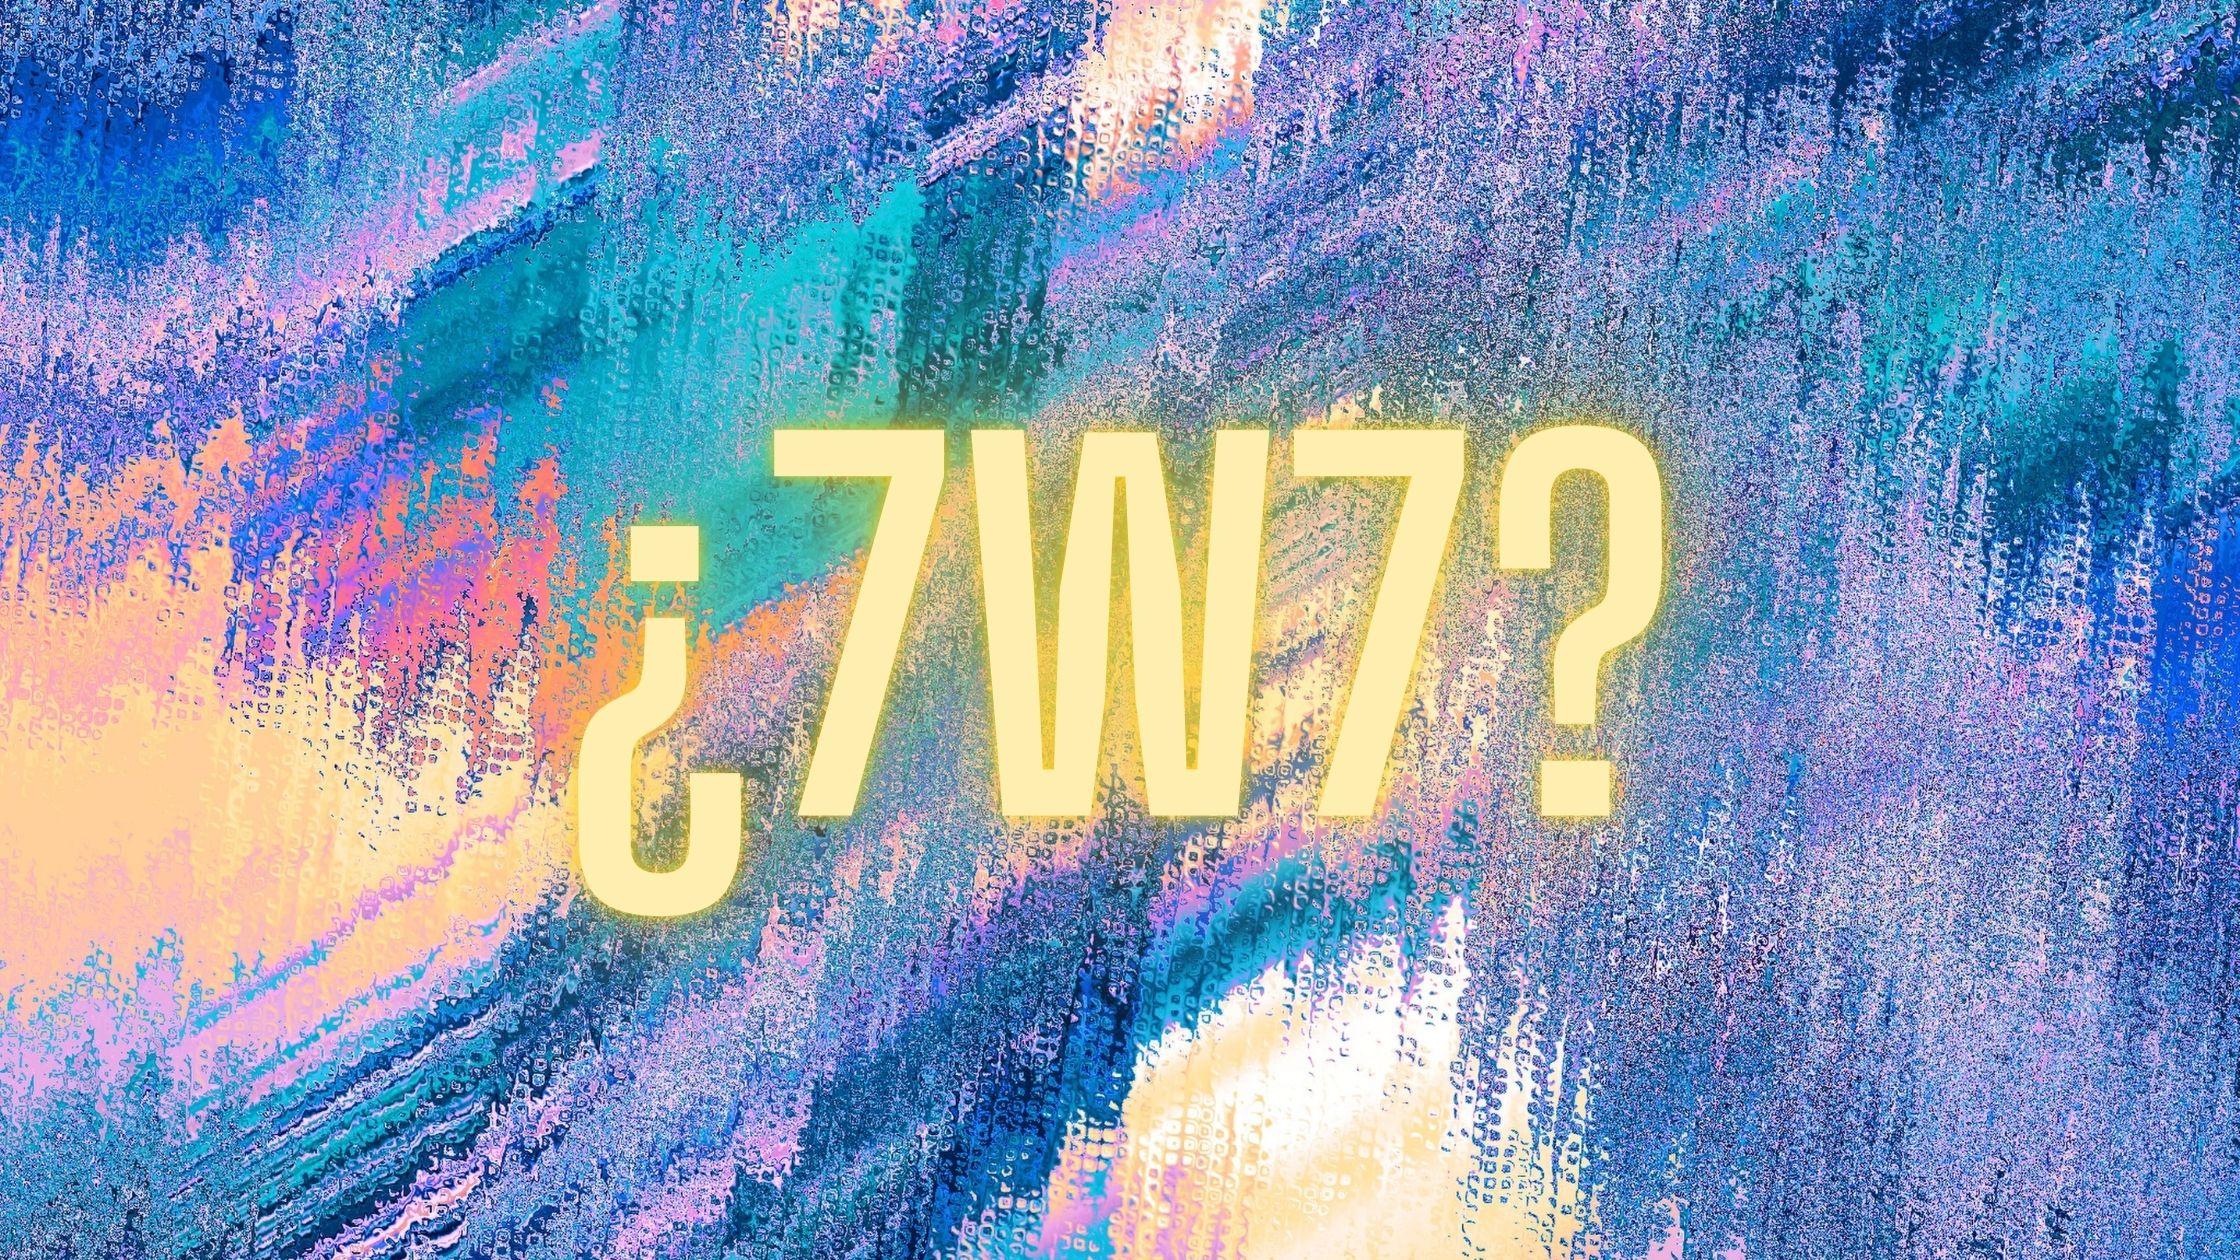 que significa 7w7